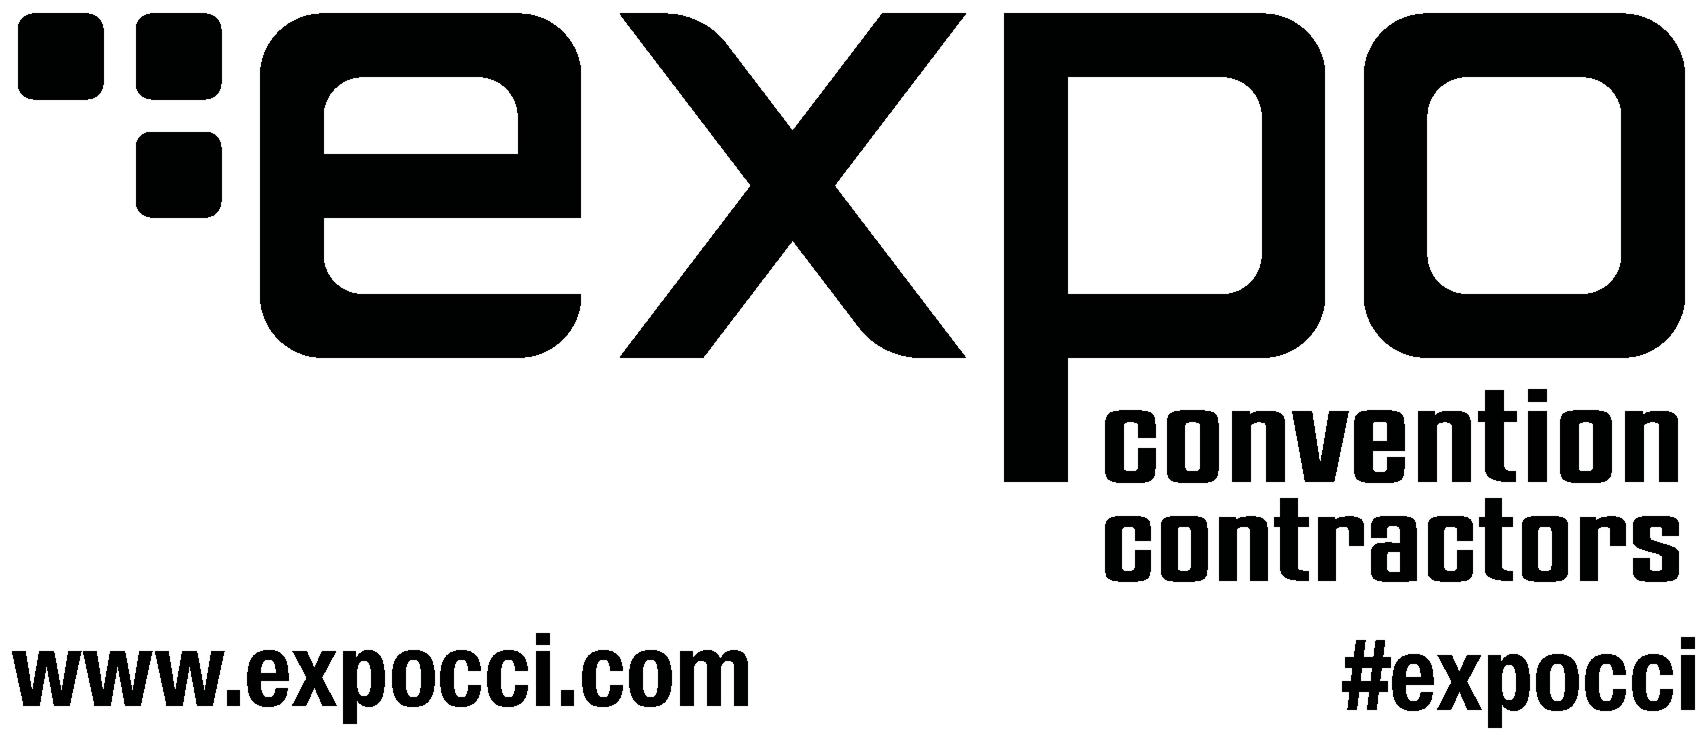 expo convention contractors